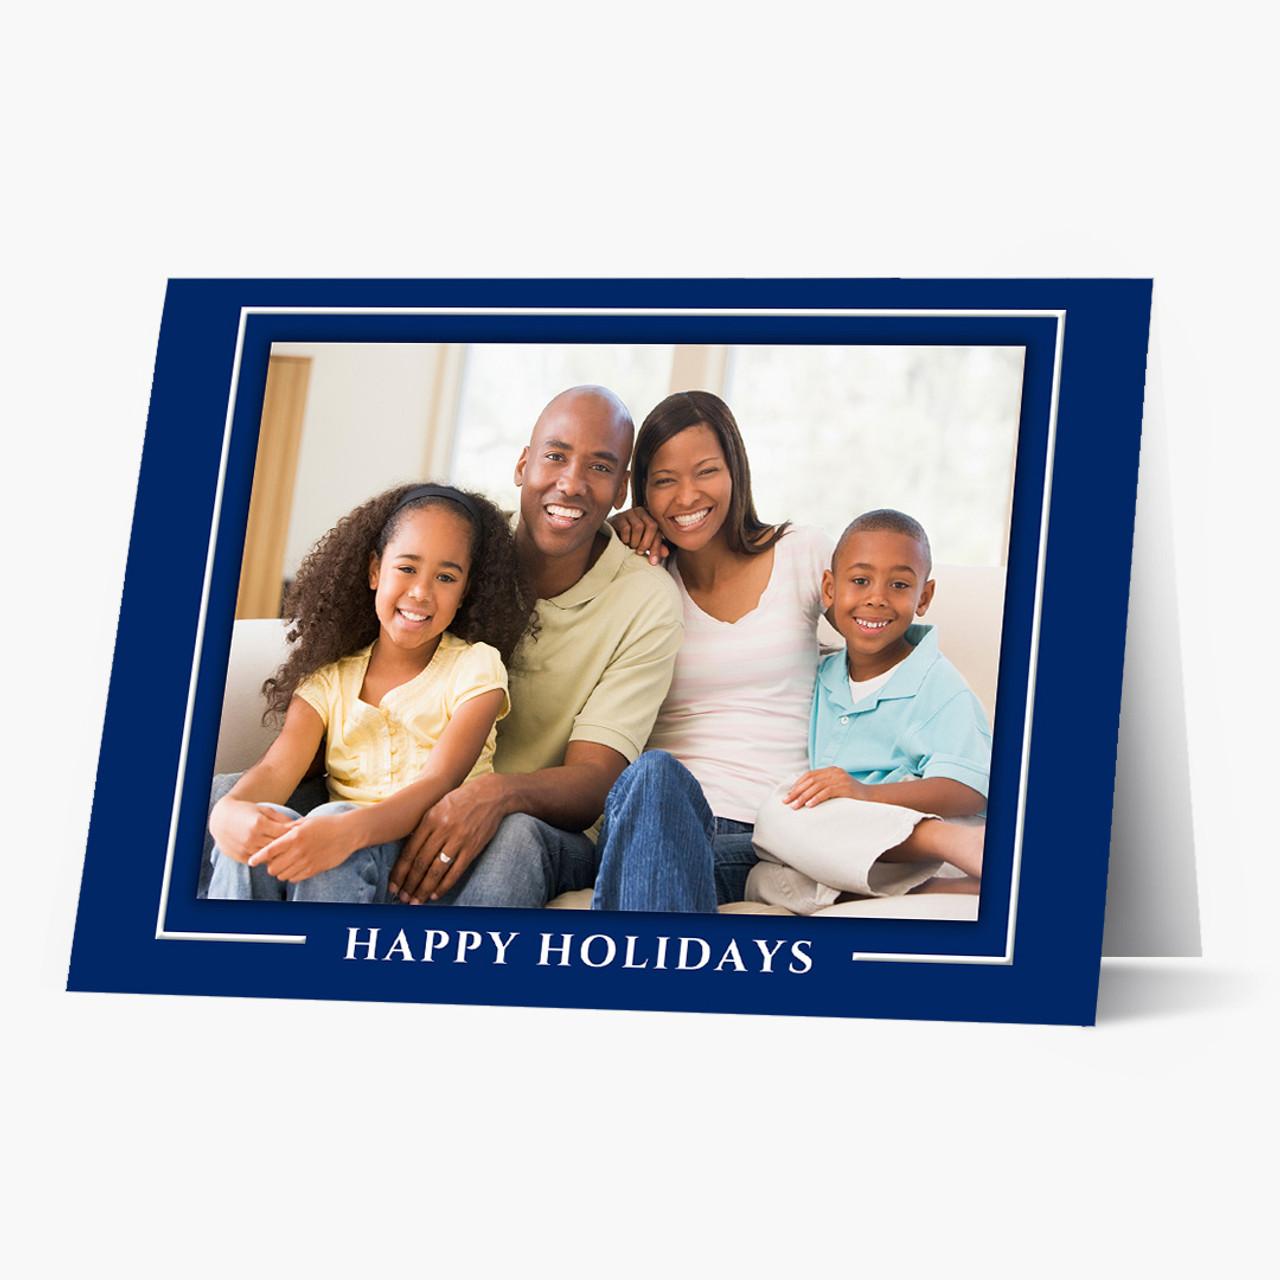 Blue Border Photo - Matte Finish Christmas Card